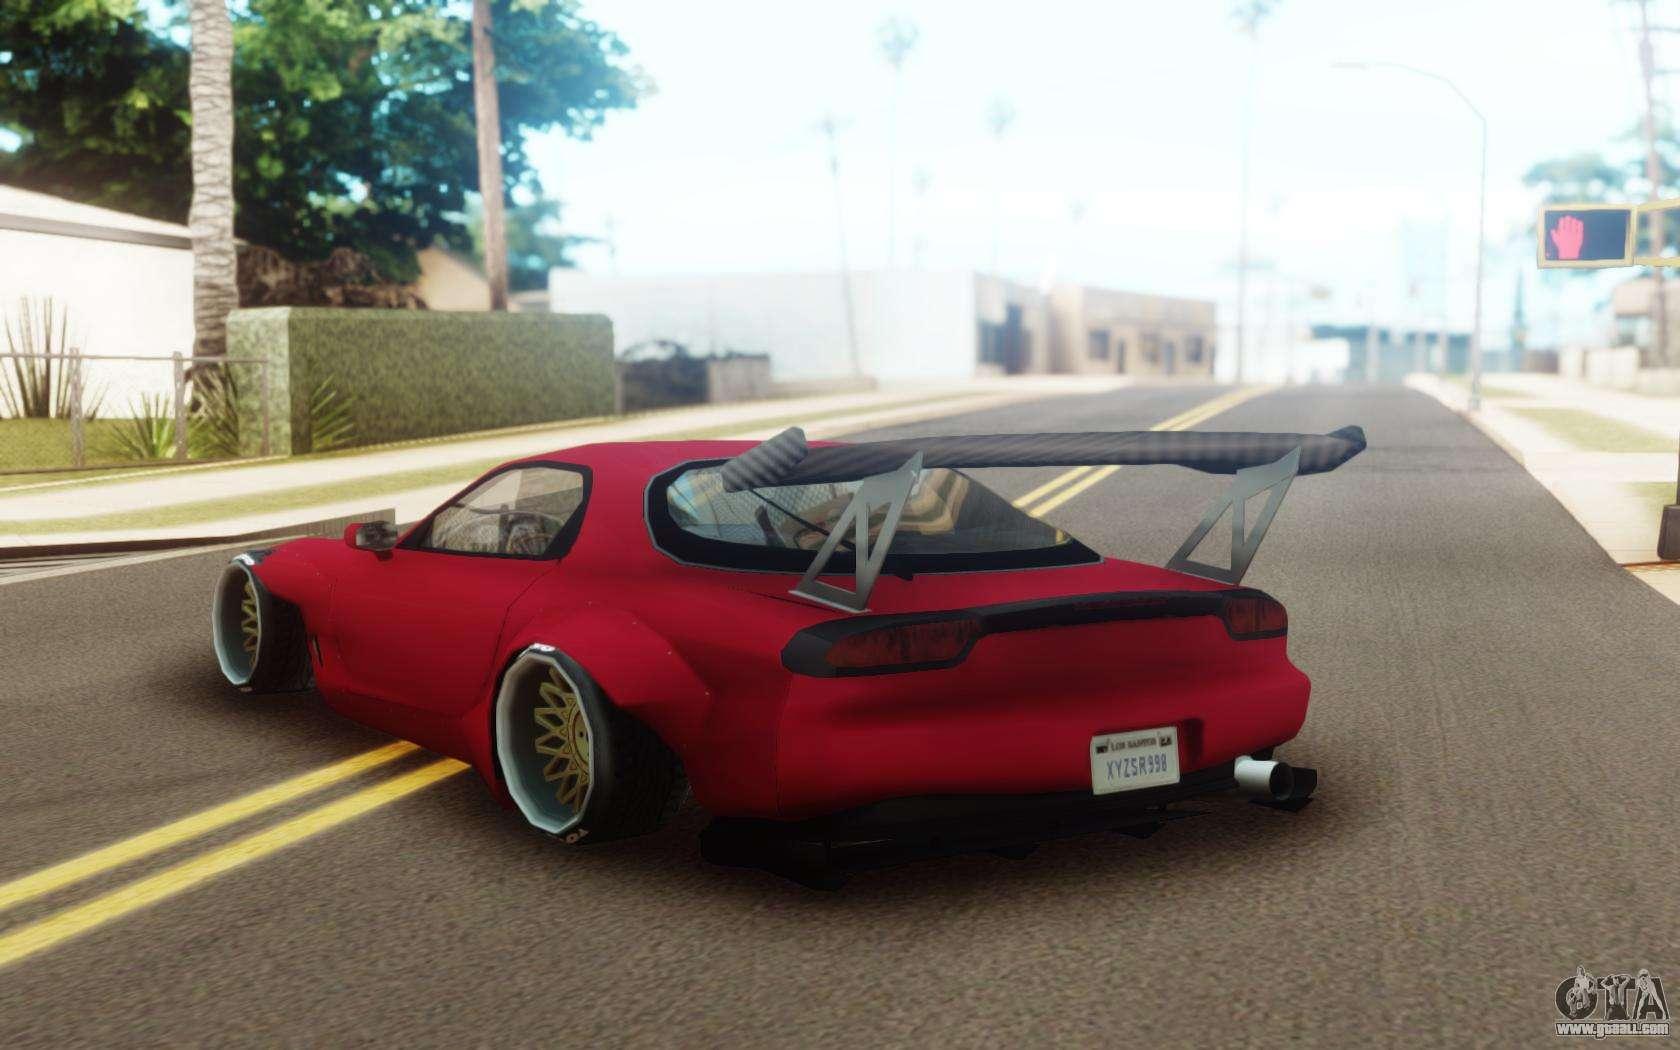 74 Mod Mobil Mazda Rx 7 Gta San Andreas HD Terbaru